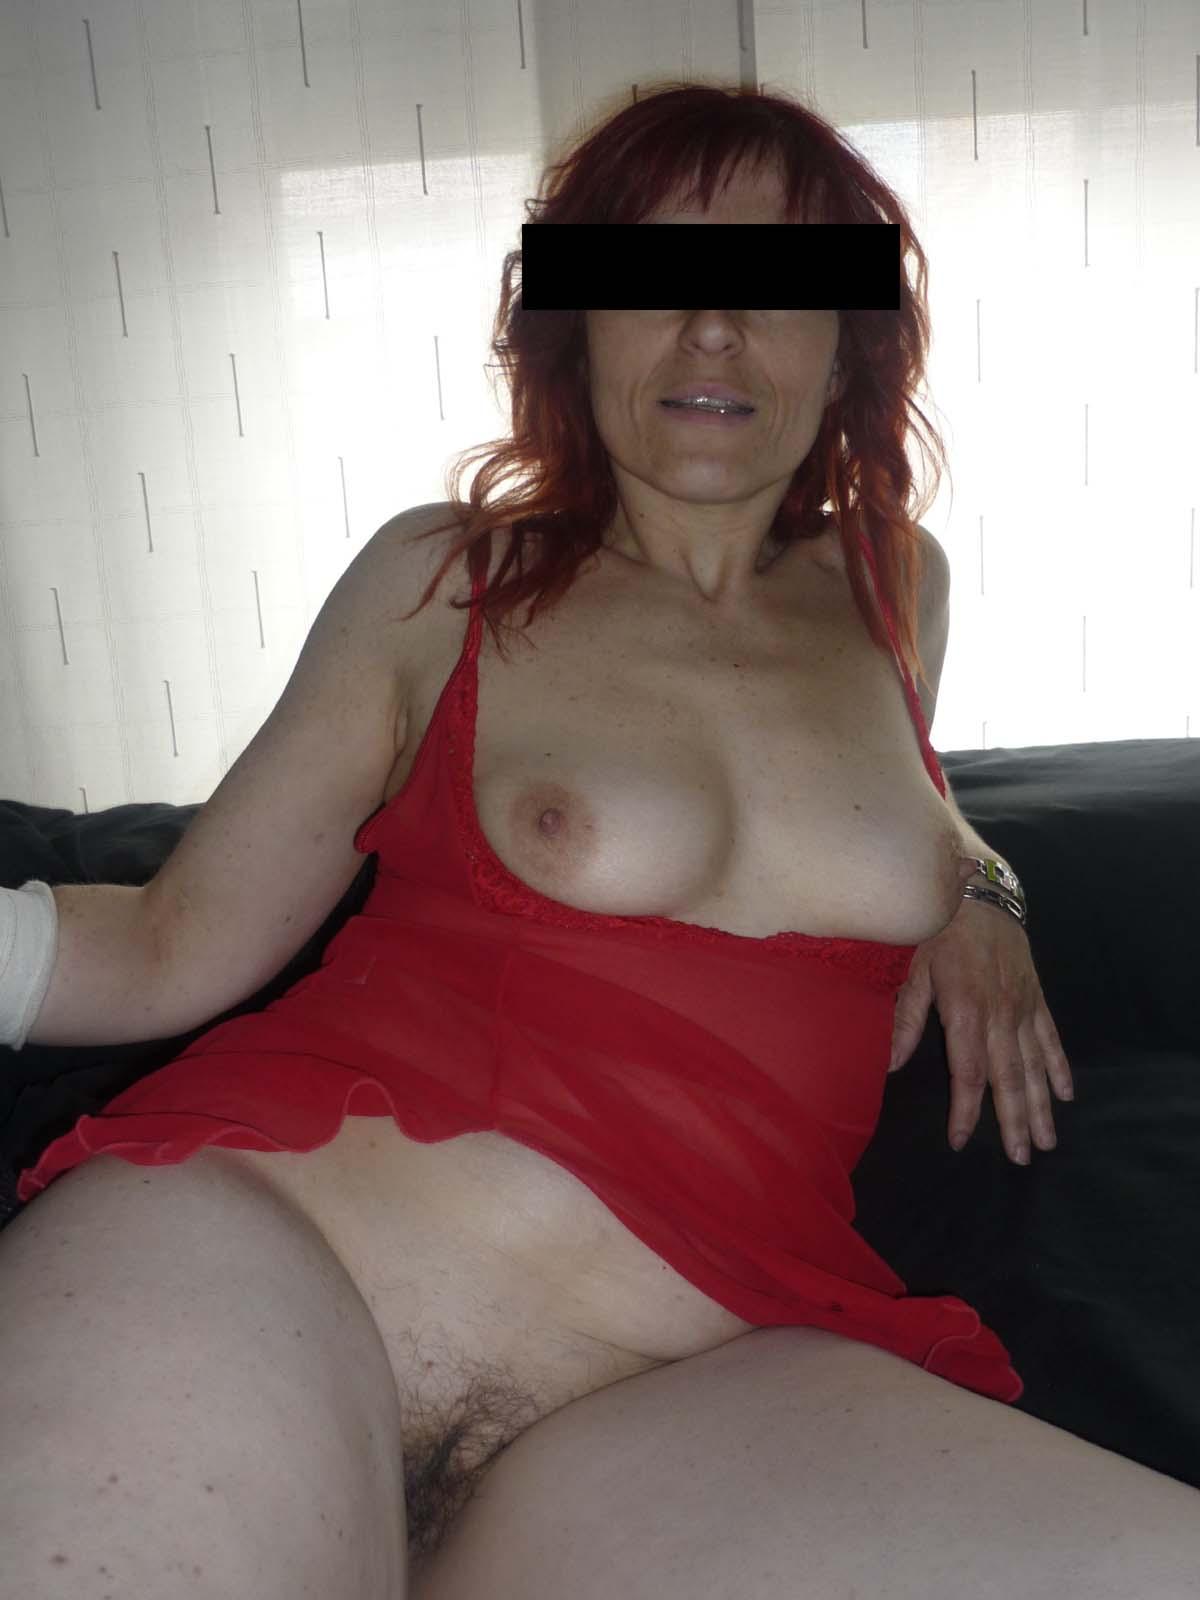 femme mure en manque de sexe montreuil